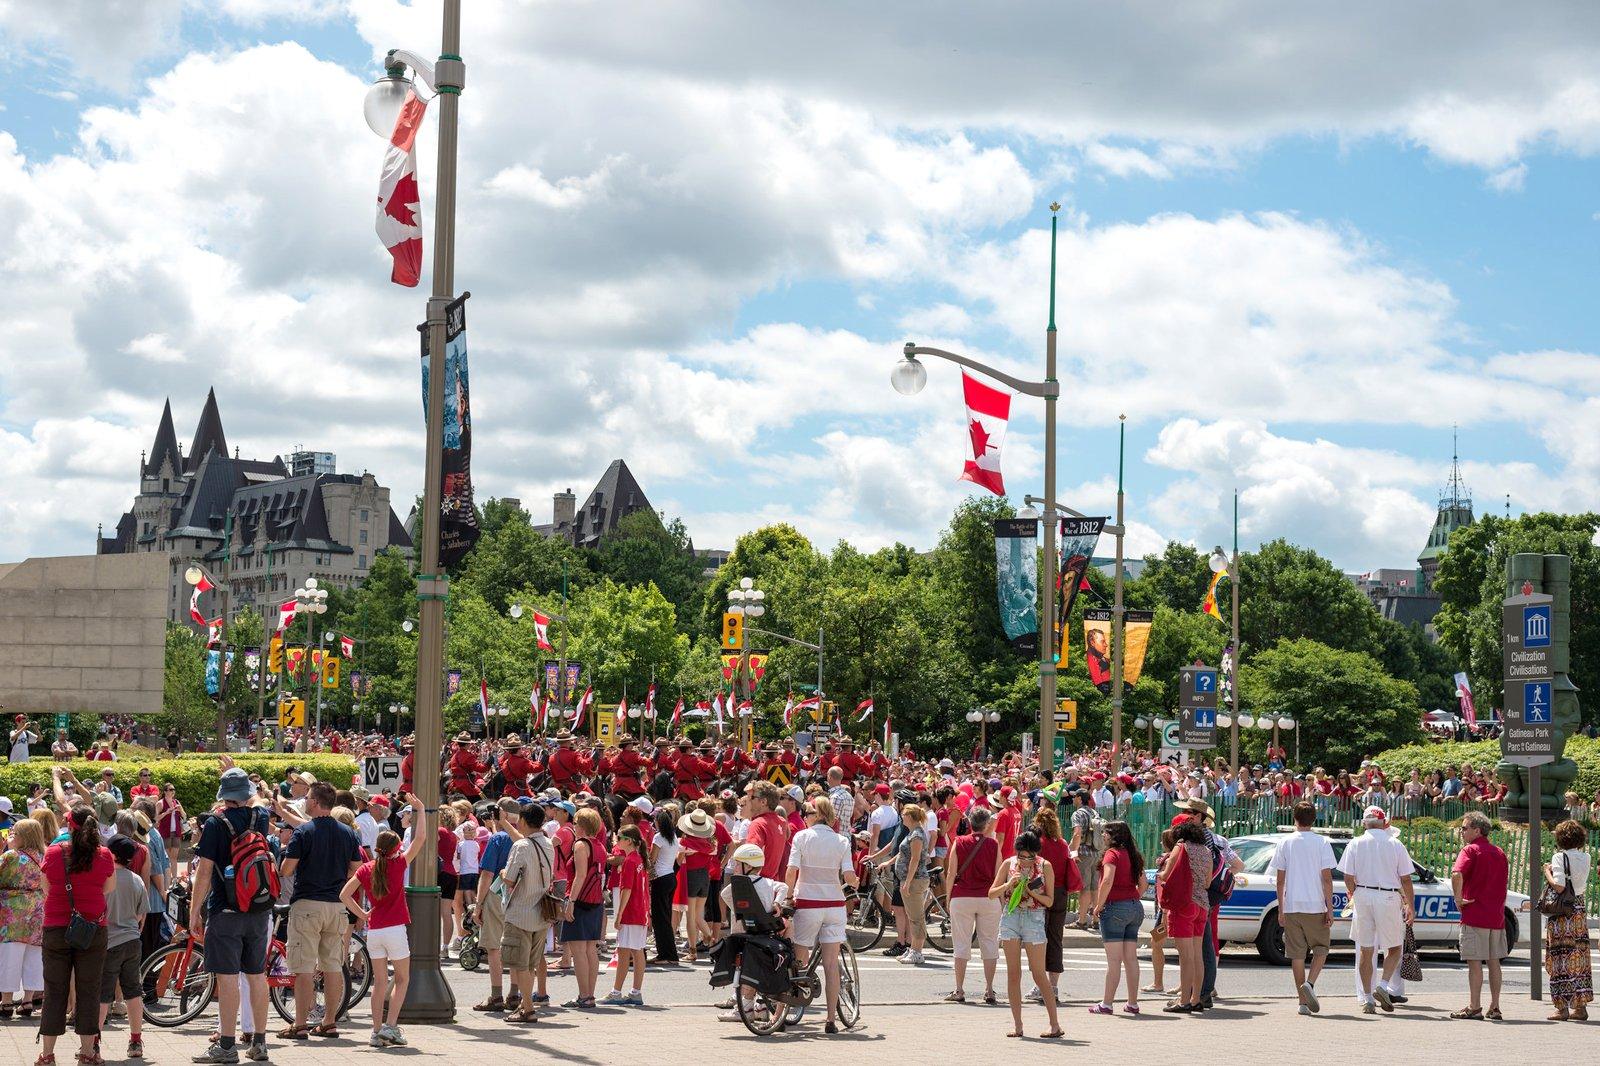 10 Best Festivals in Ottawa - Amazing Ottawa Celebrations You Won't Find Elsewhere – Go Guides